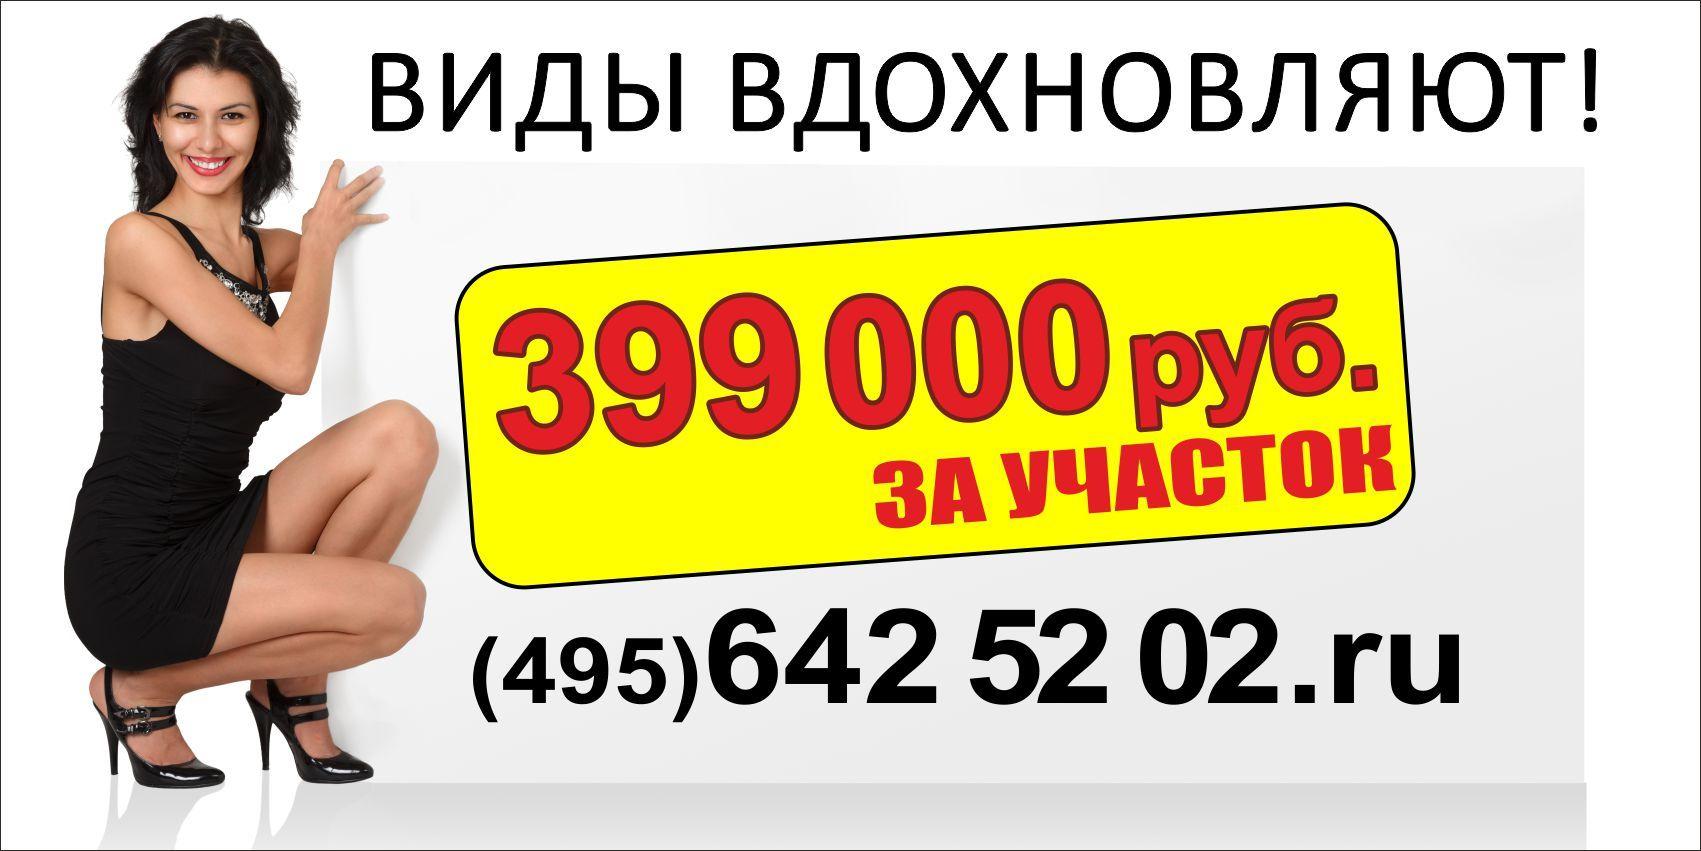 Рекламный баннер 3х6 - дизайнер Navsekaya